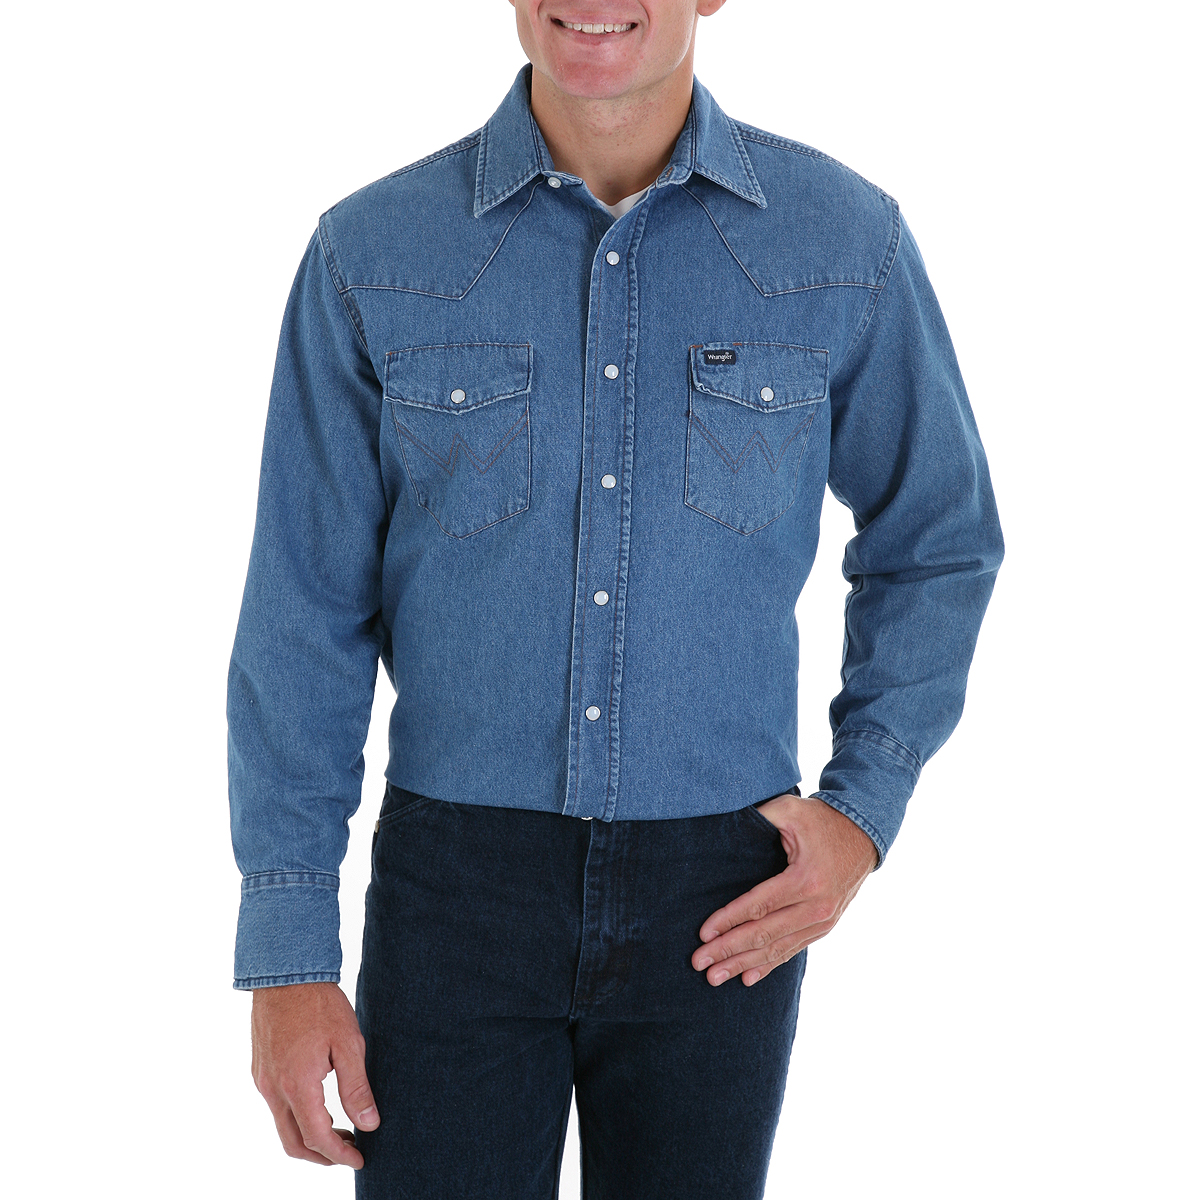 d50381a2ea9 Wrangler Mens Cowboy Cut Work Western Long Sleeve Shirt - BCD Tofu House